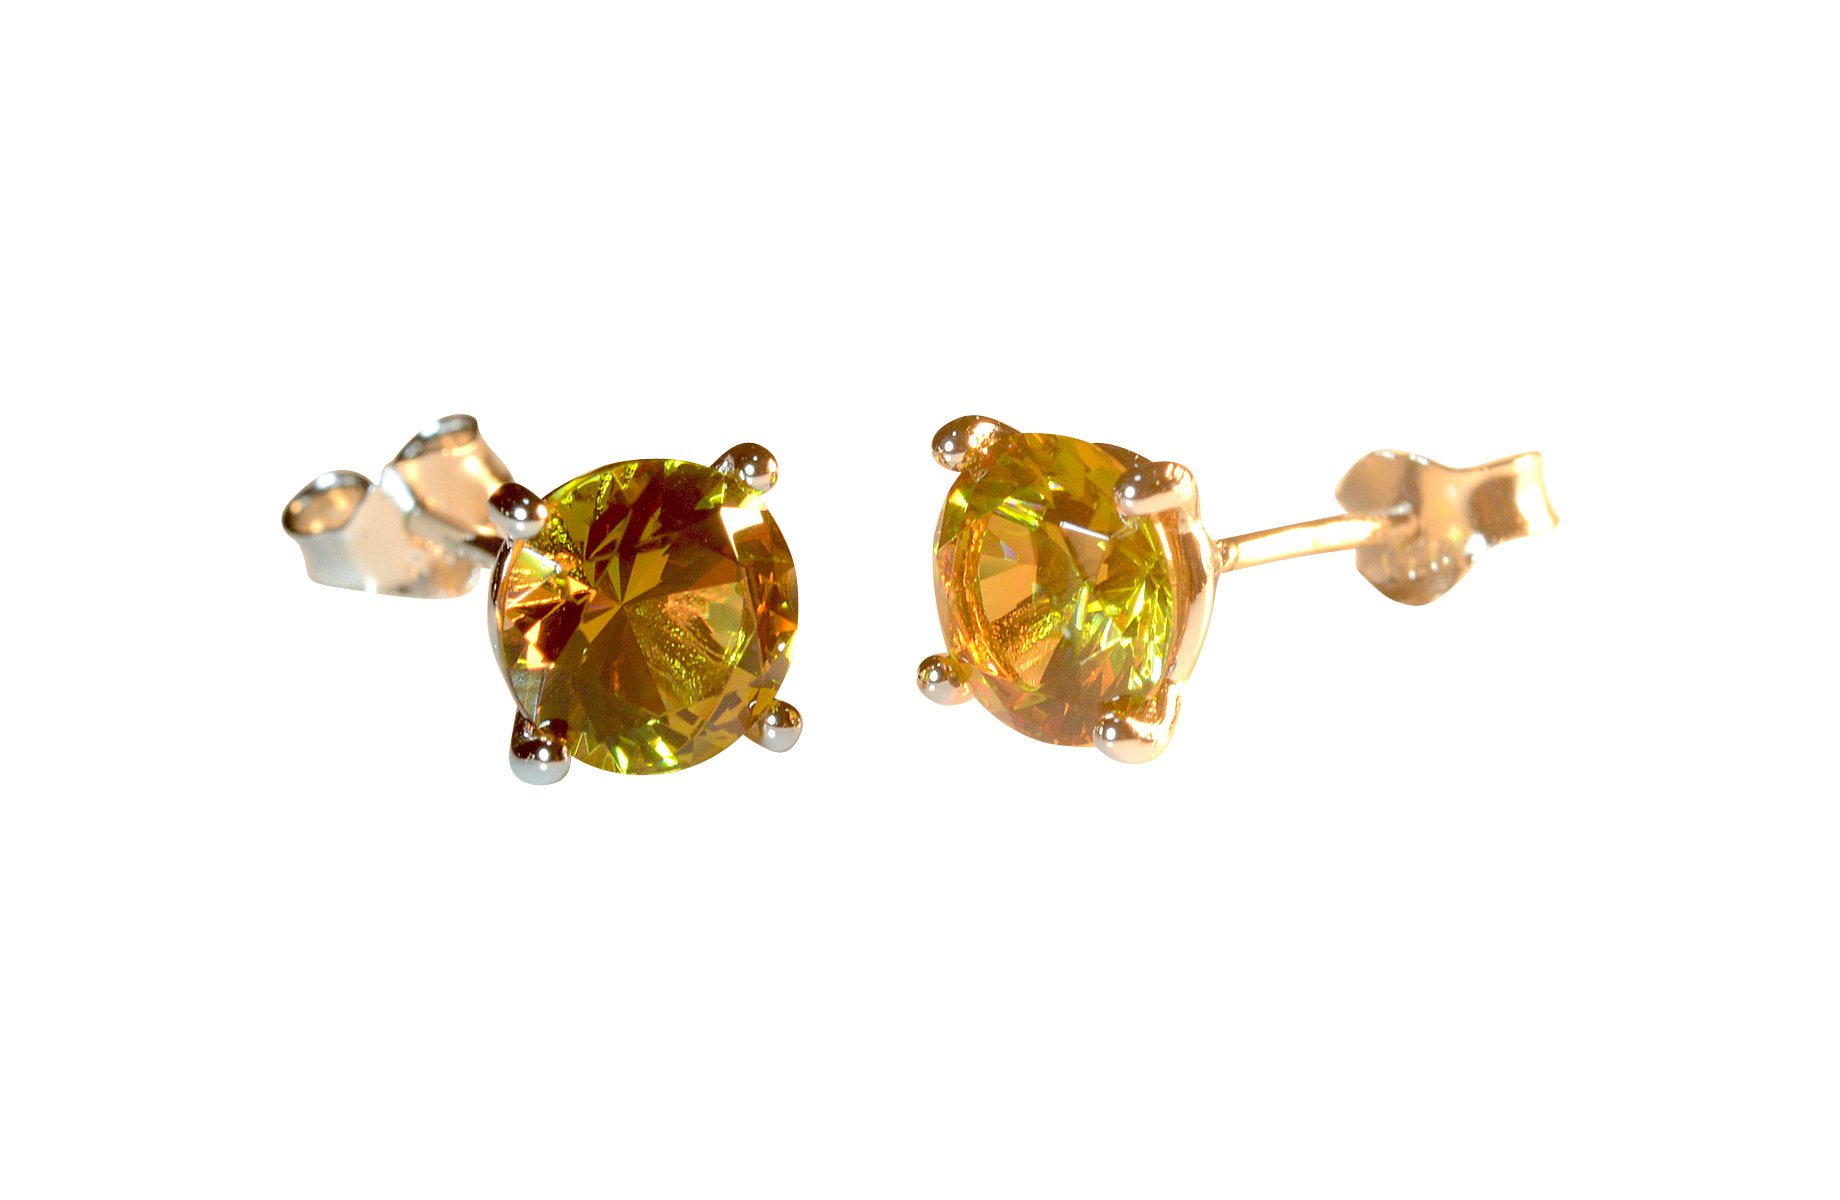 Stud Earrings Alexandrite Earrings Color Changing Gem Stud Earrings Fine Jewelry Sterling Silver Stud Earrings Silver Earrings